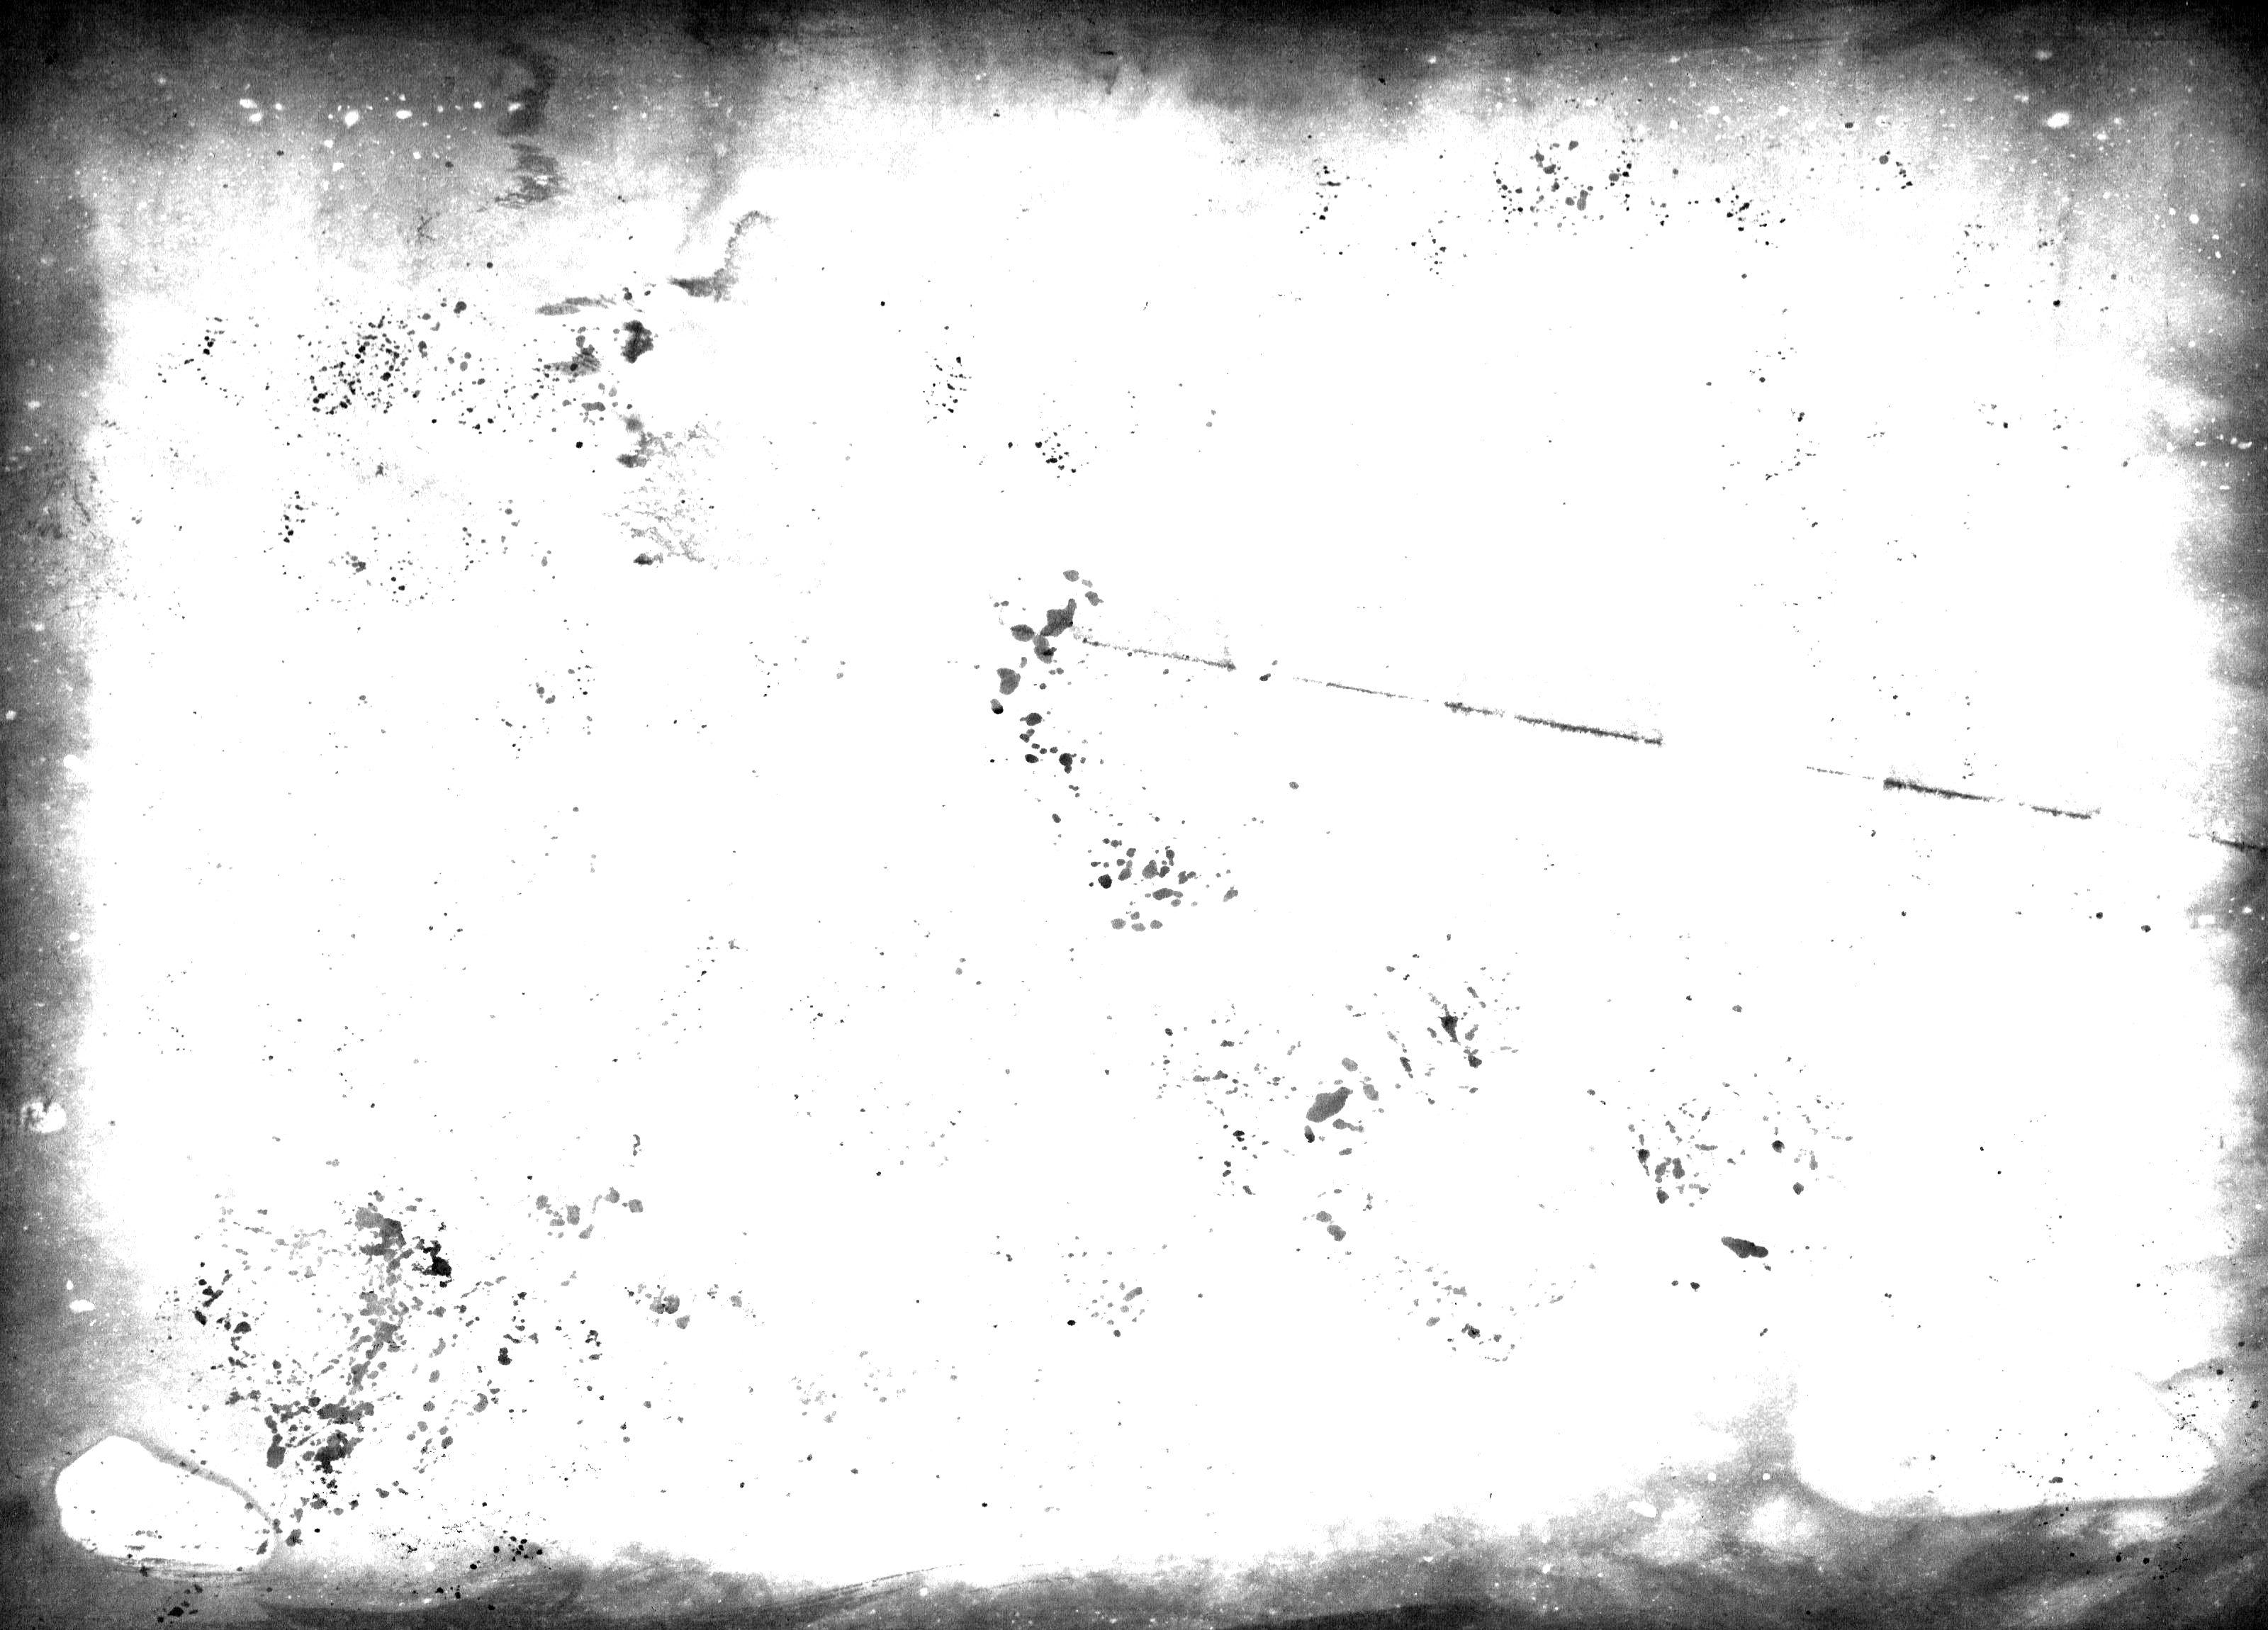 10 Grunge Texture Black and White (JPG) | OnlyGFX.com